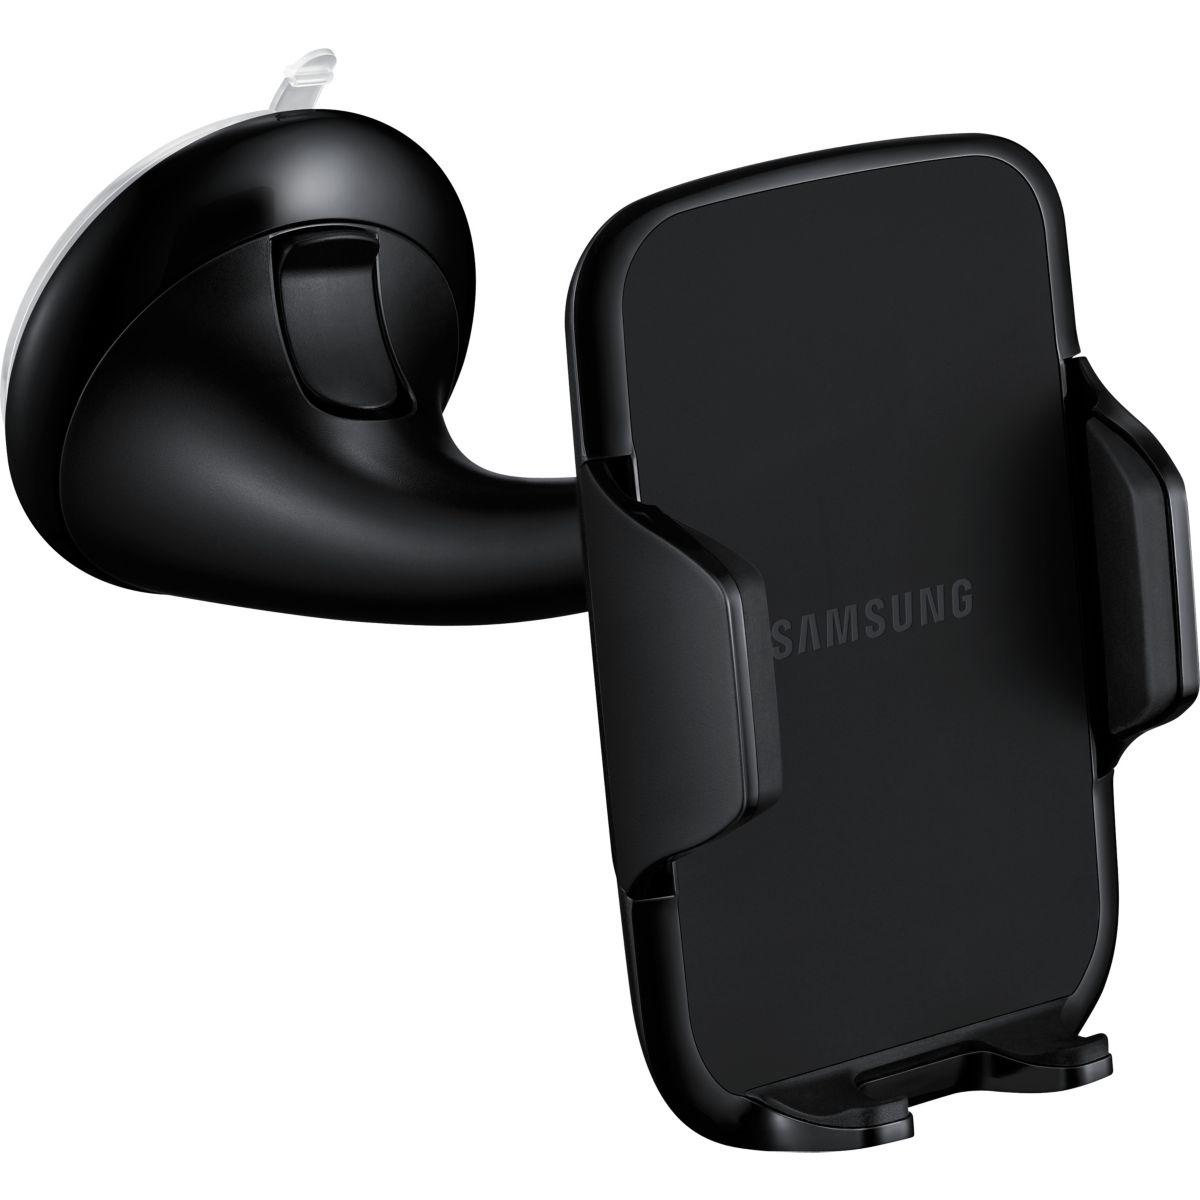 Support smartphone samsung voiture universel - livraison offerte : code liv (photo)